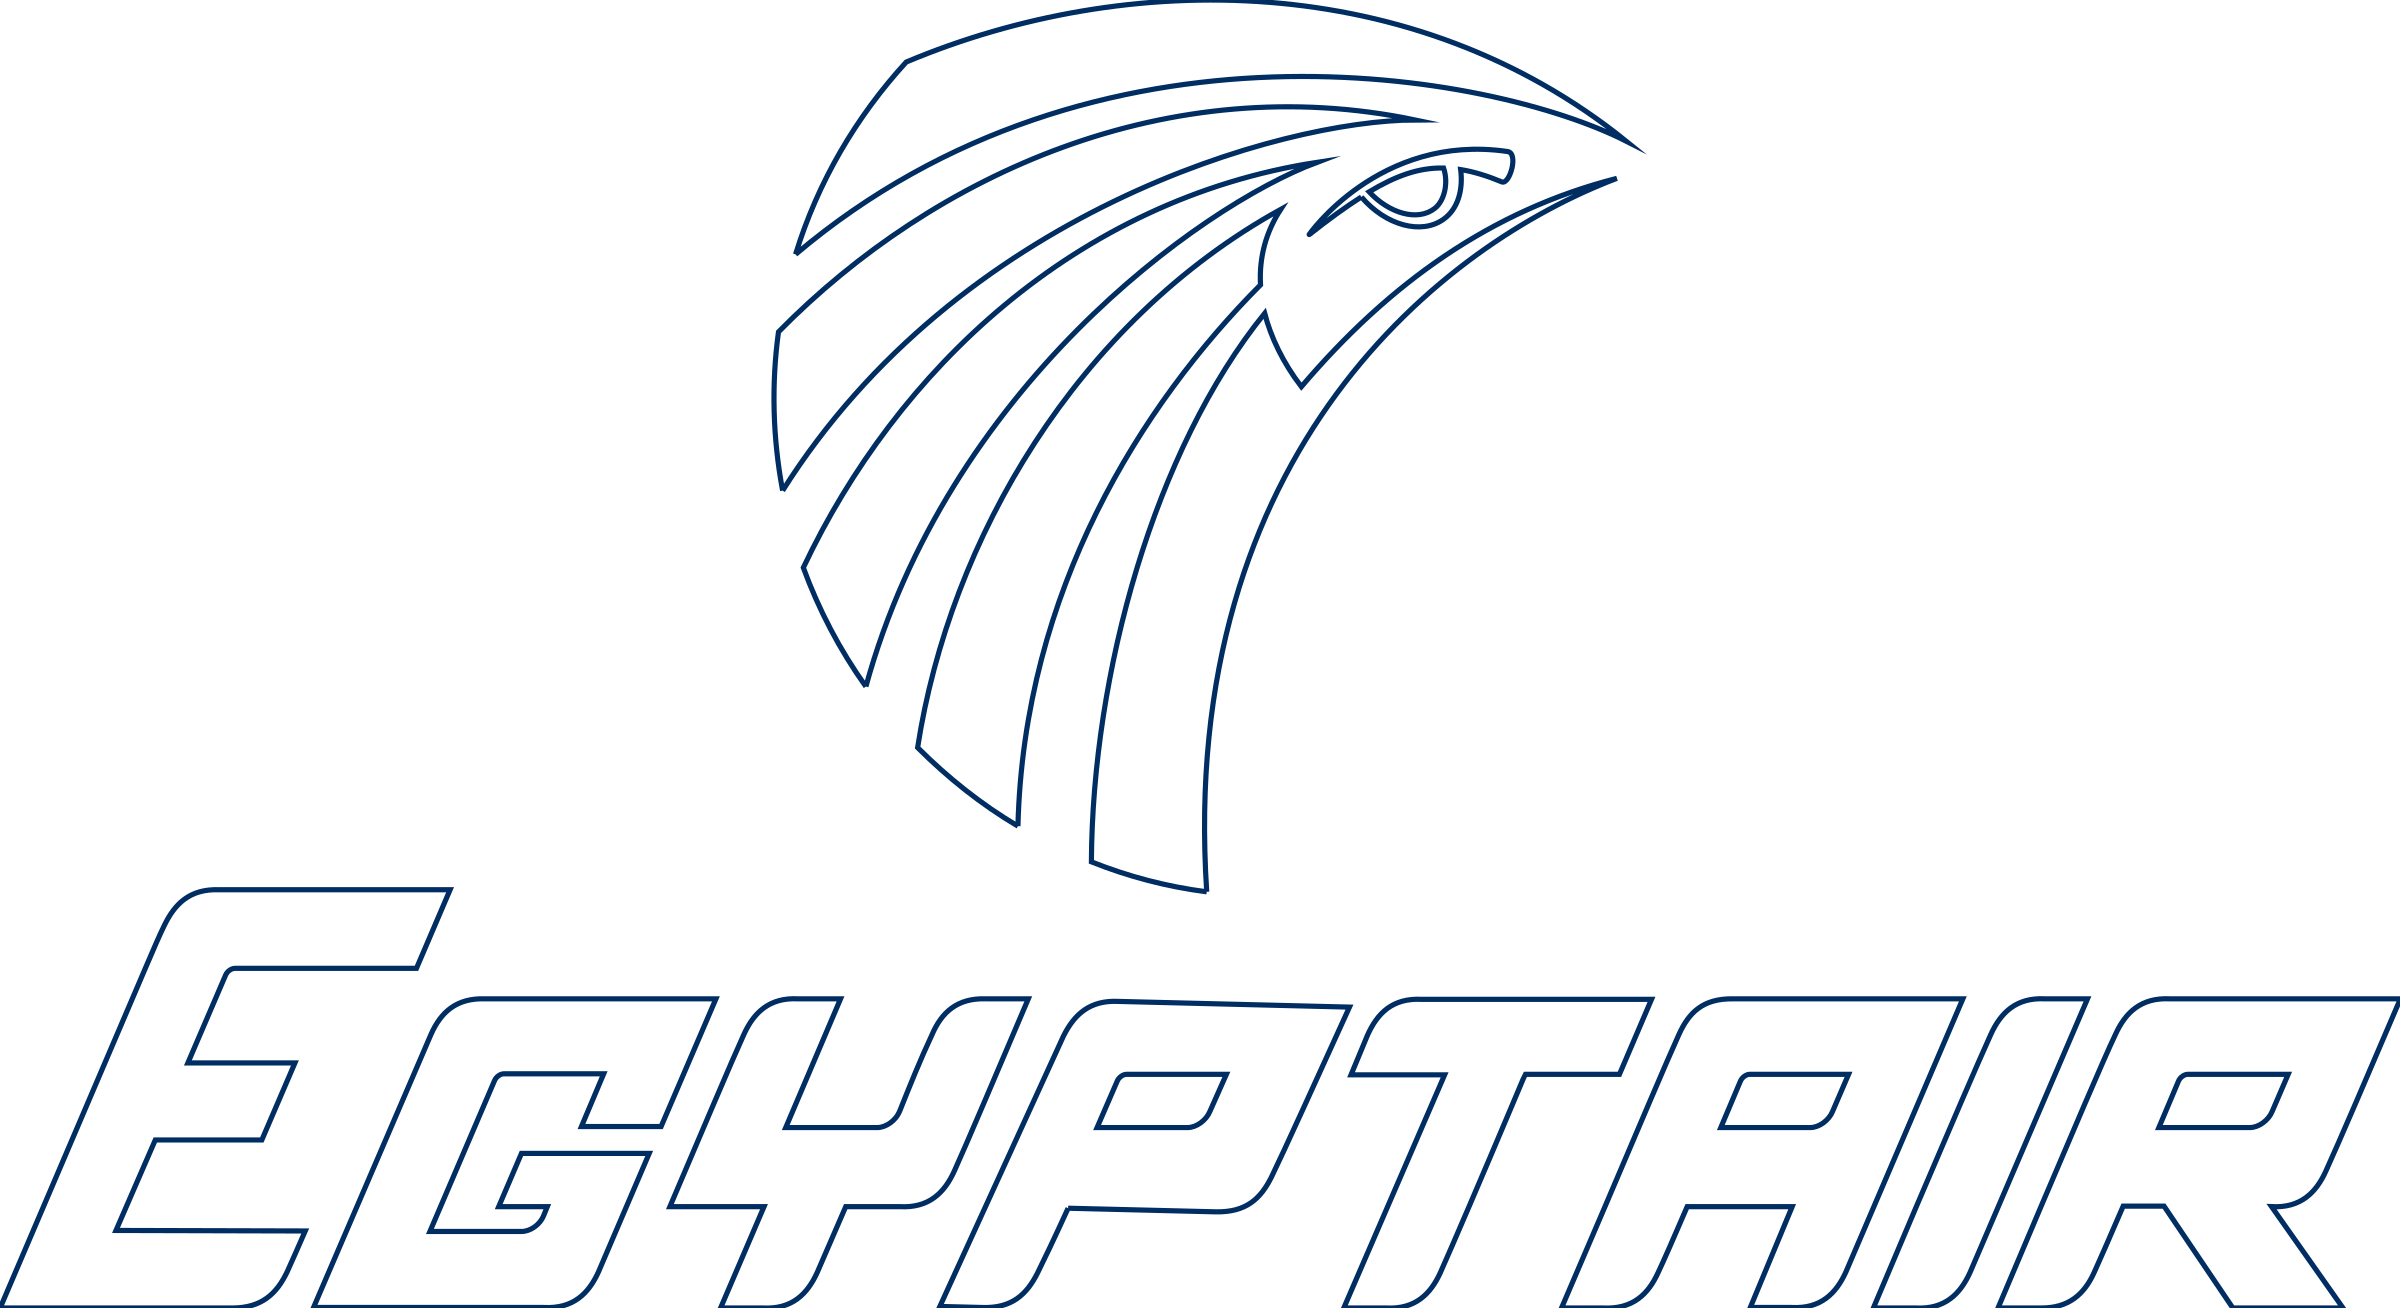 Egypt Air Logo PNG Transparent & SVG Vector.